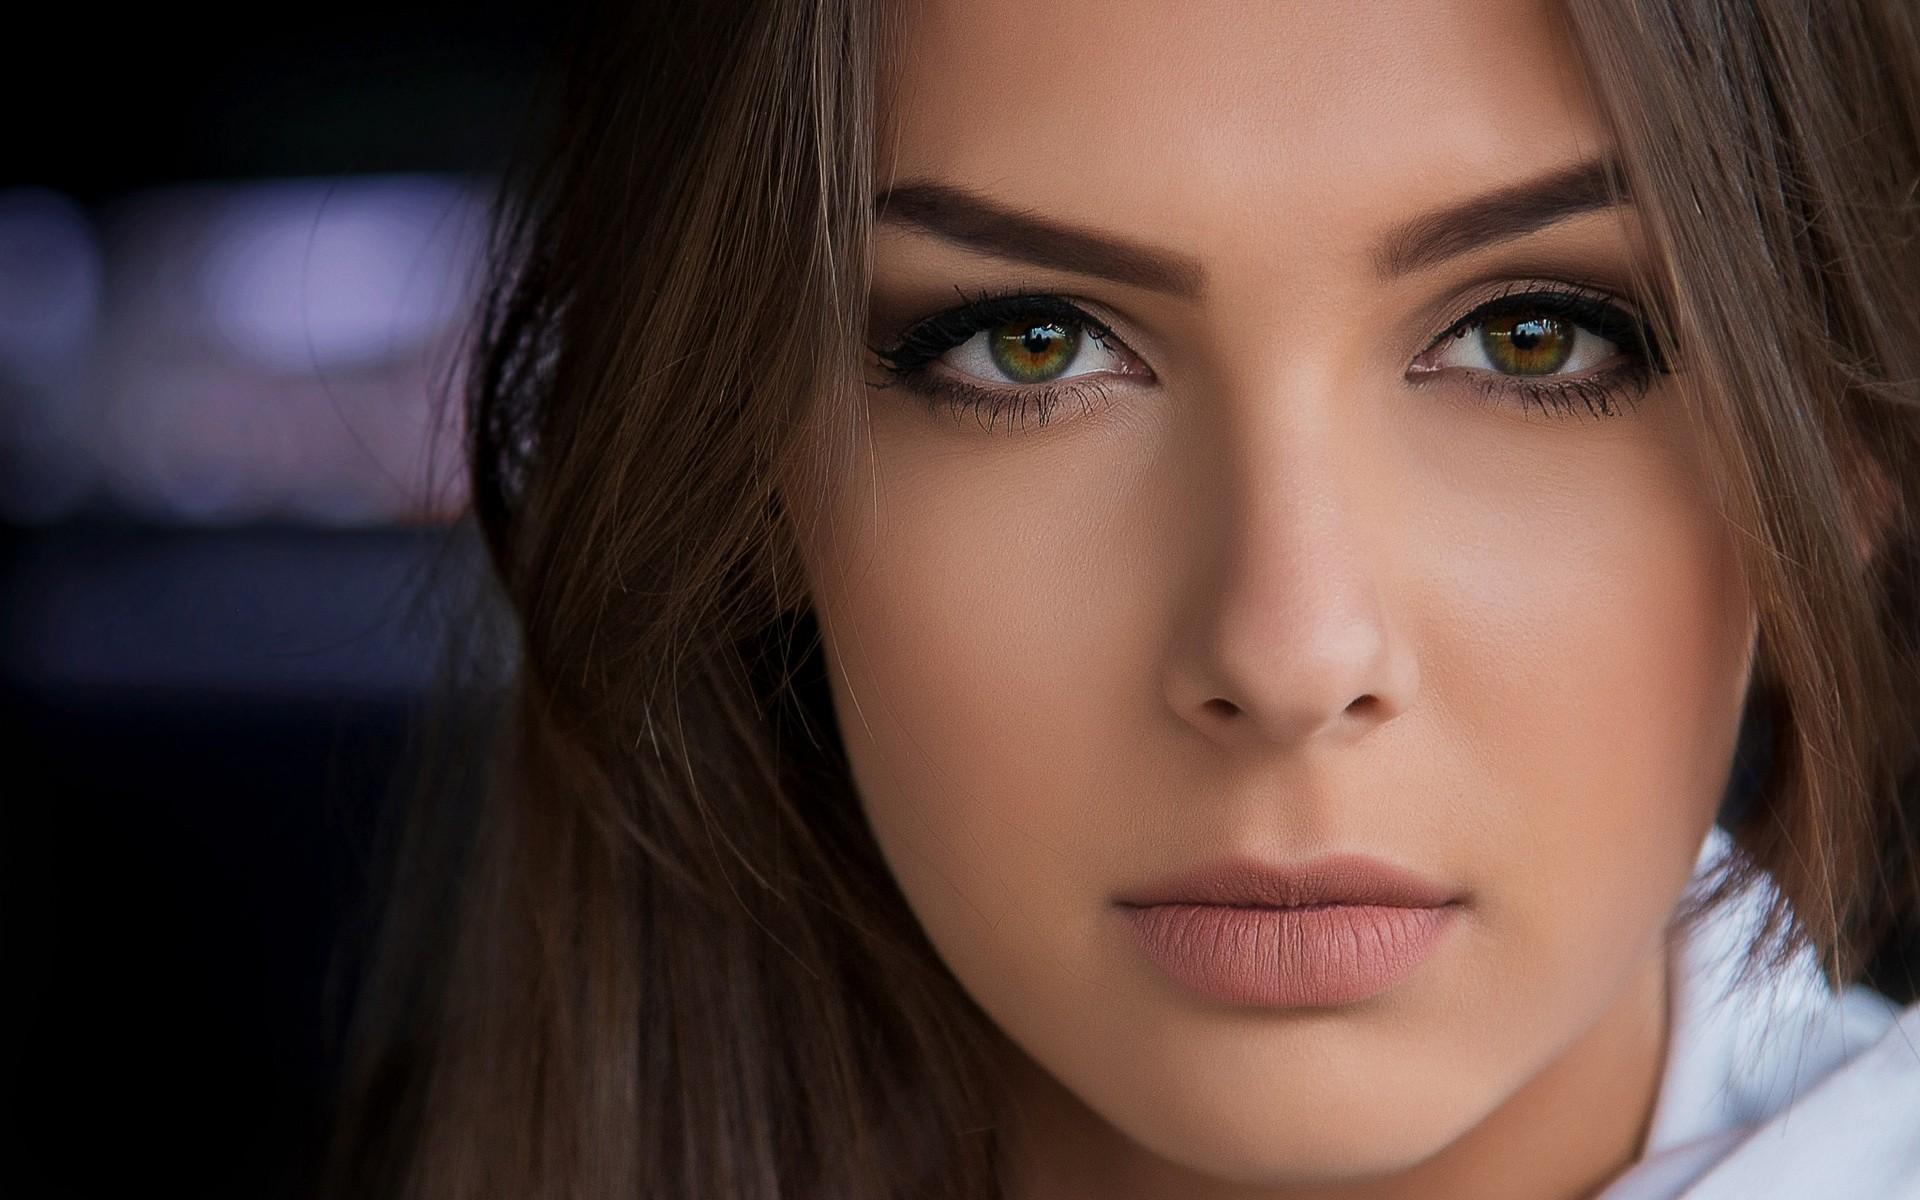 Wallpaper : face, Photoshop, women, model, glasses, black